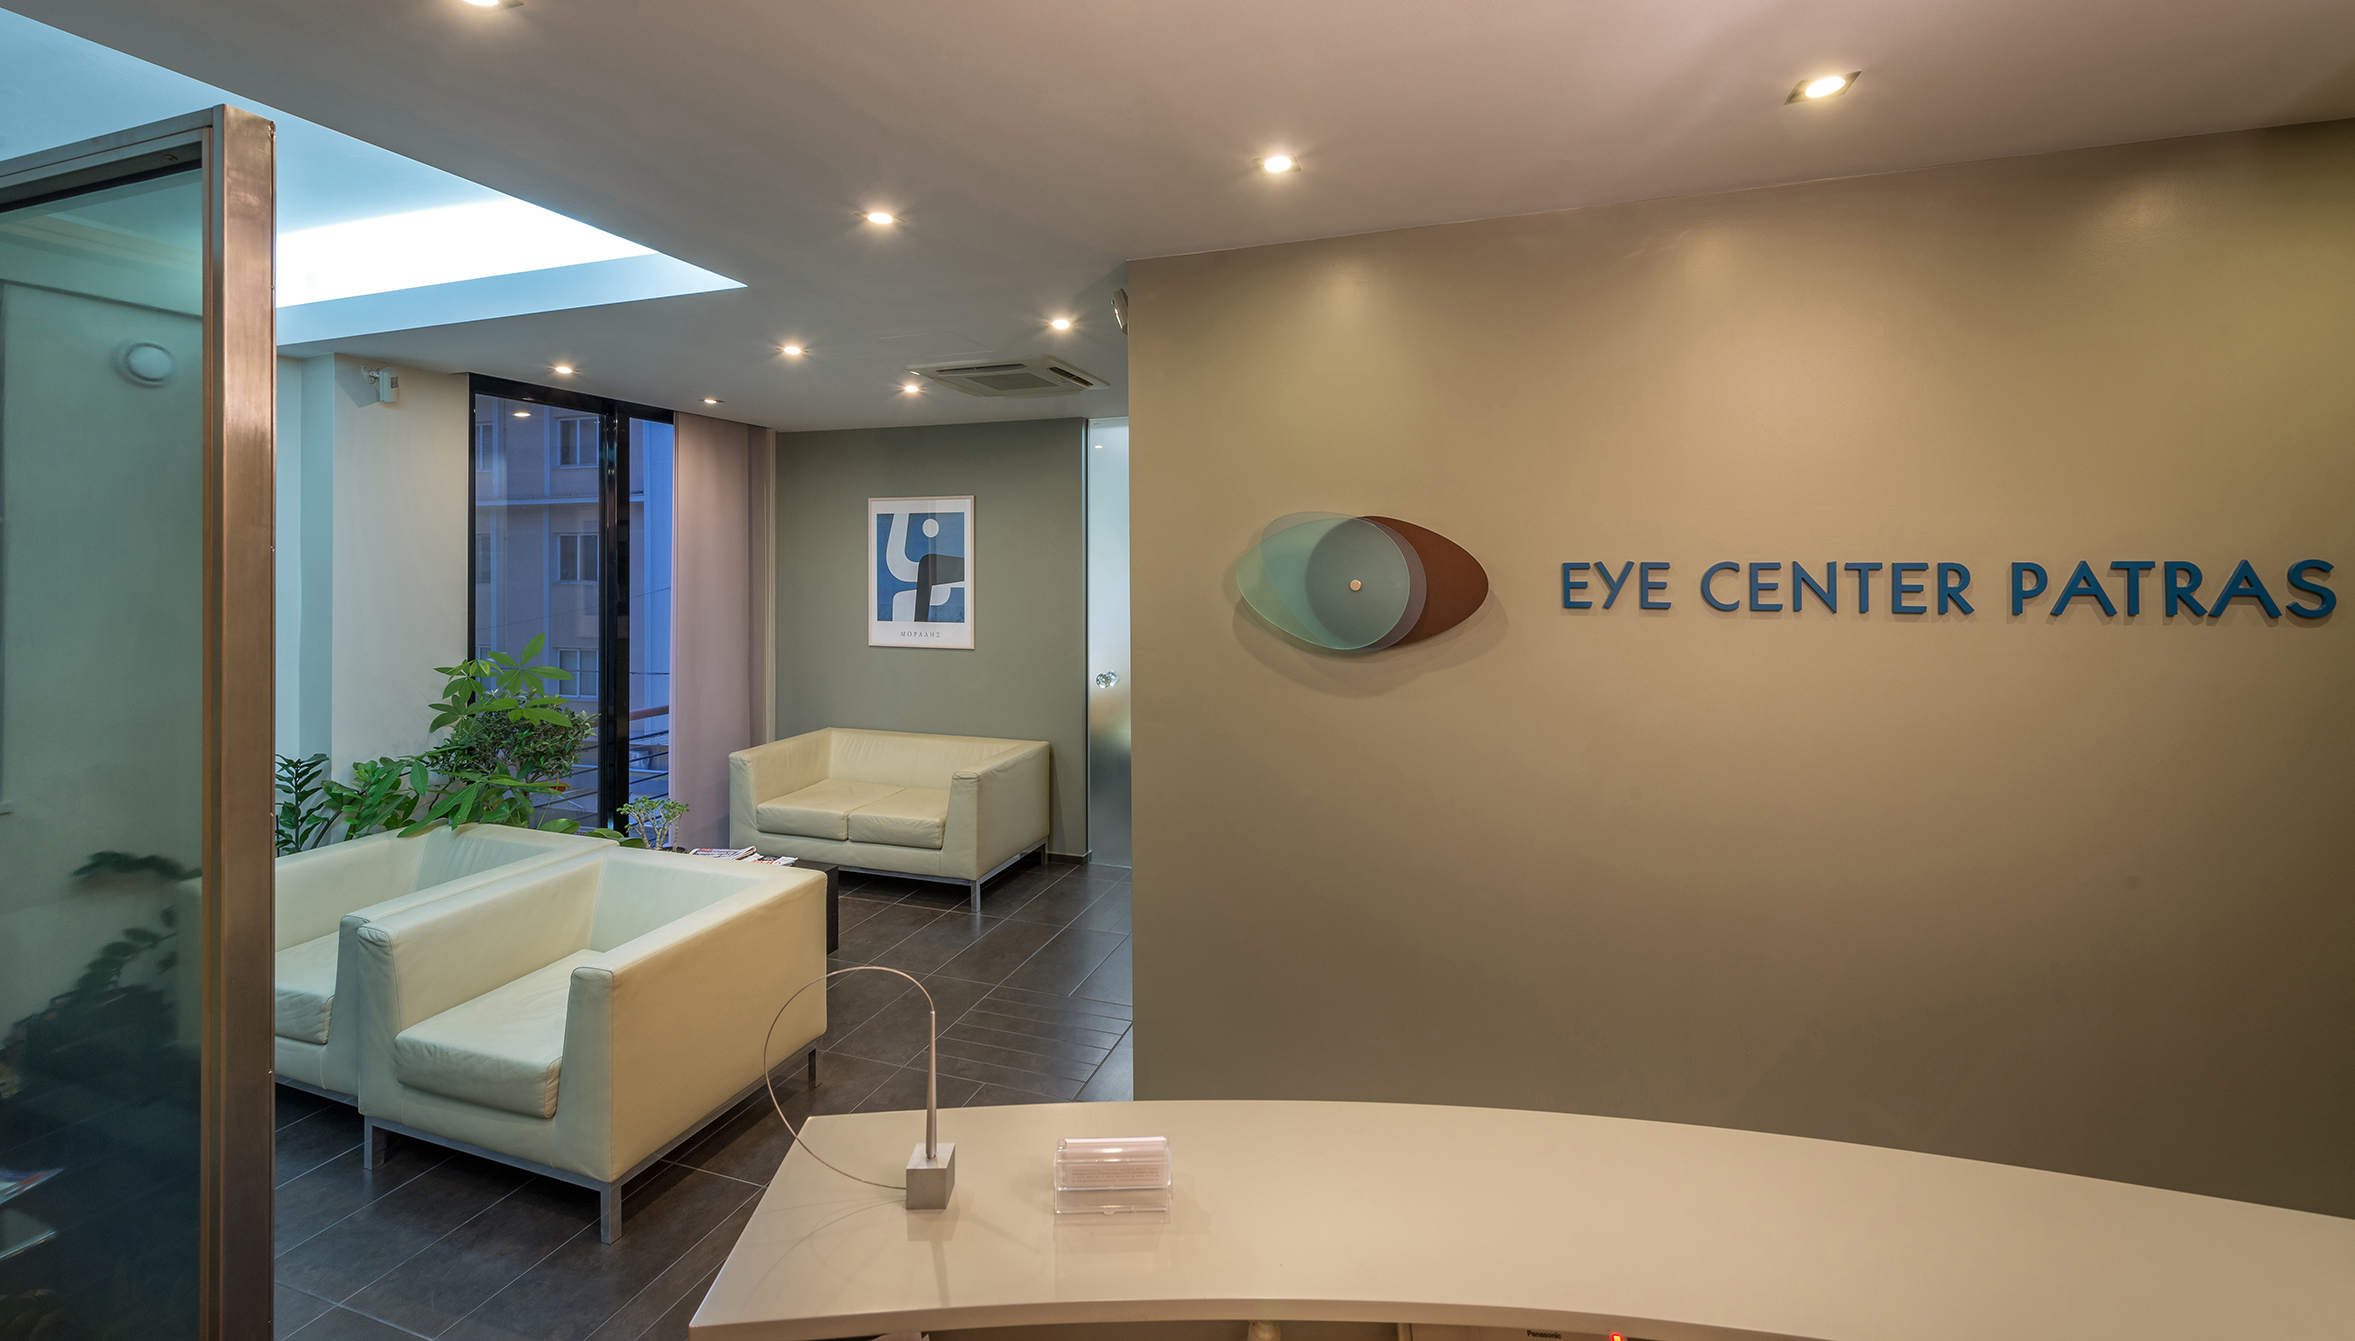 12_EyeCenter